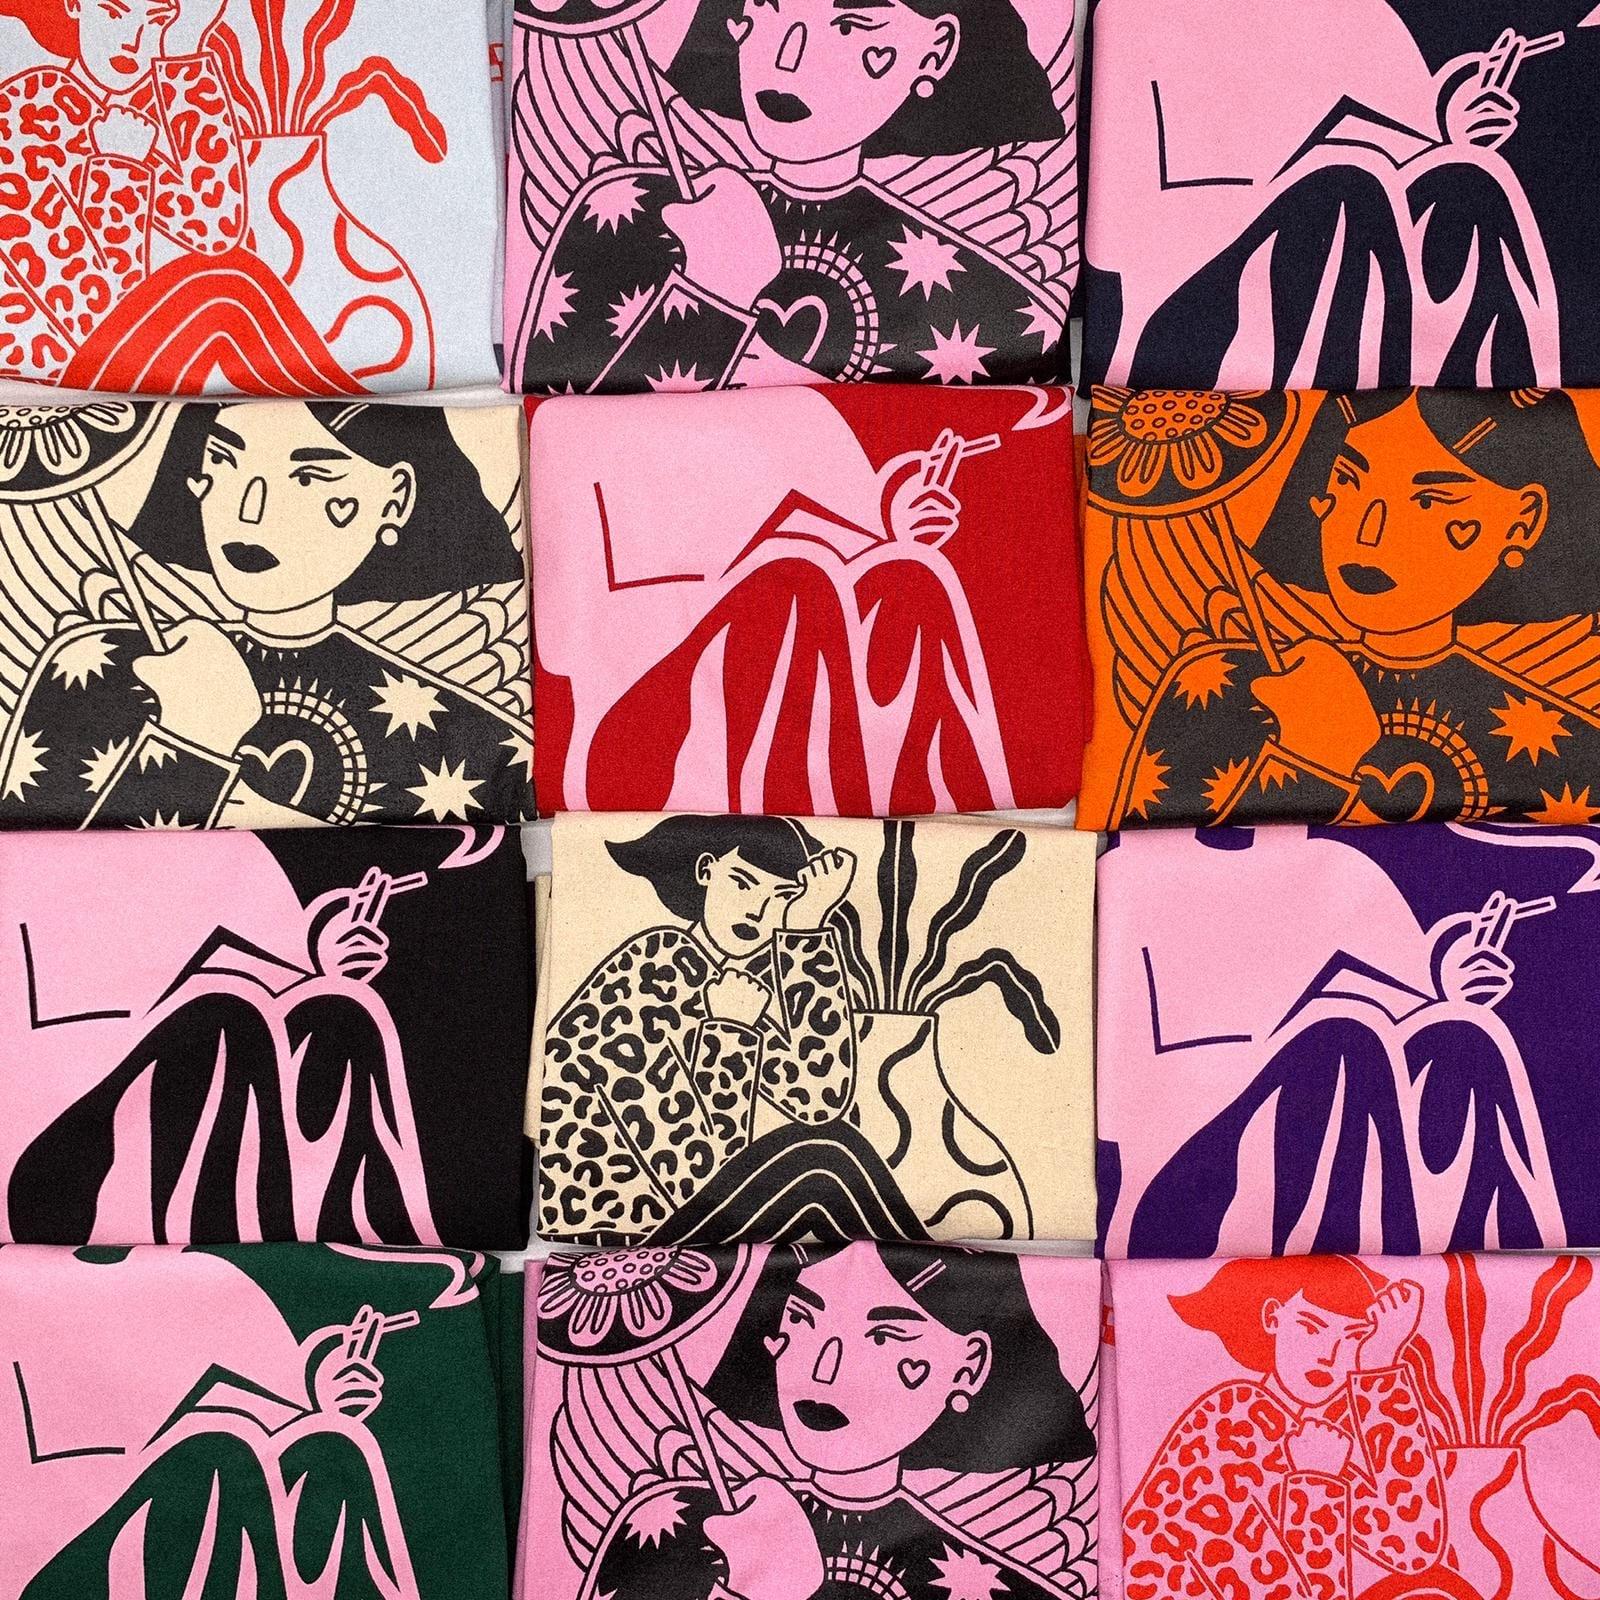 Eva Malley art designs